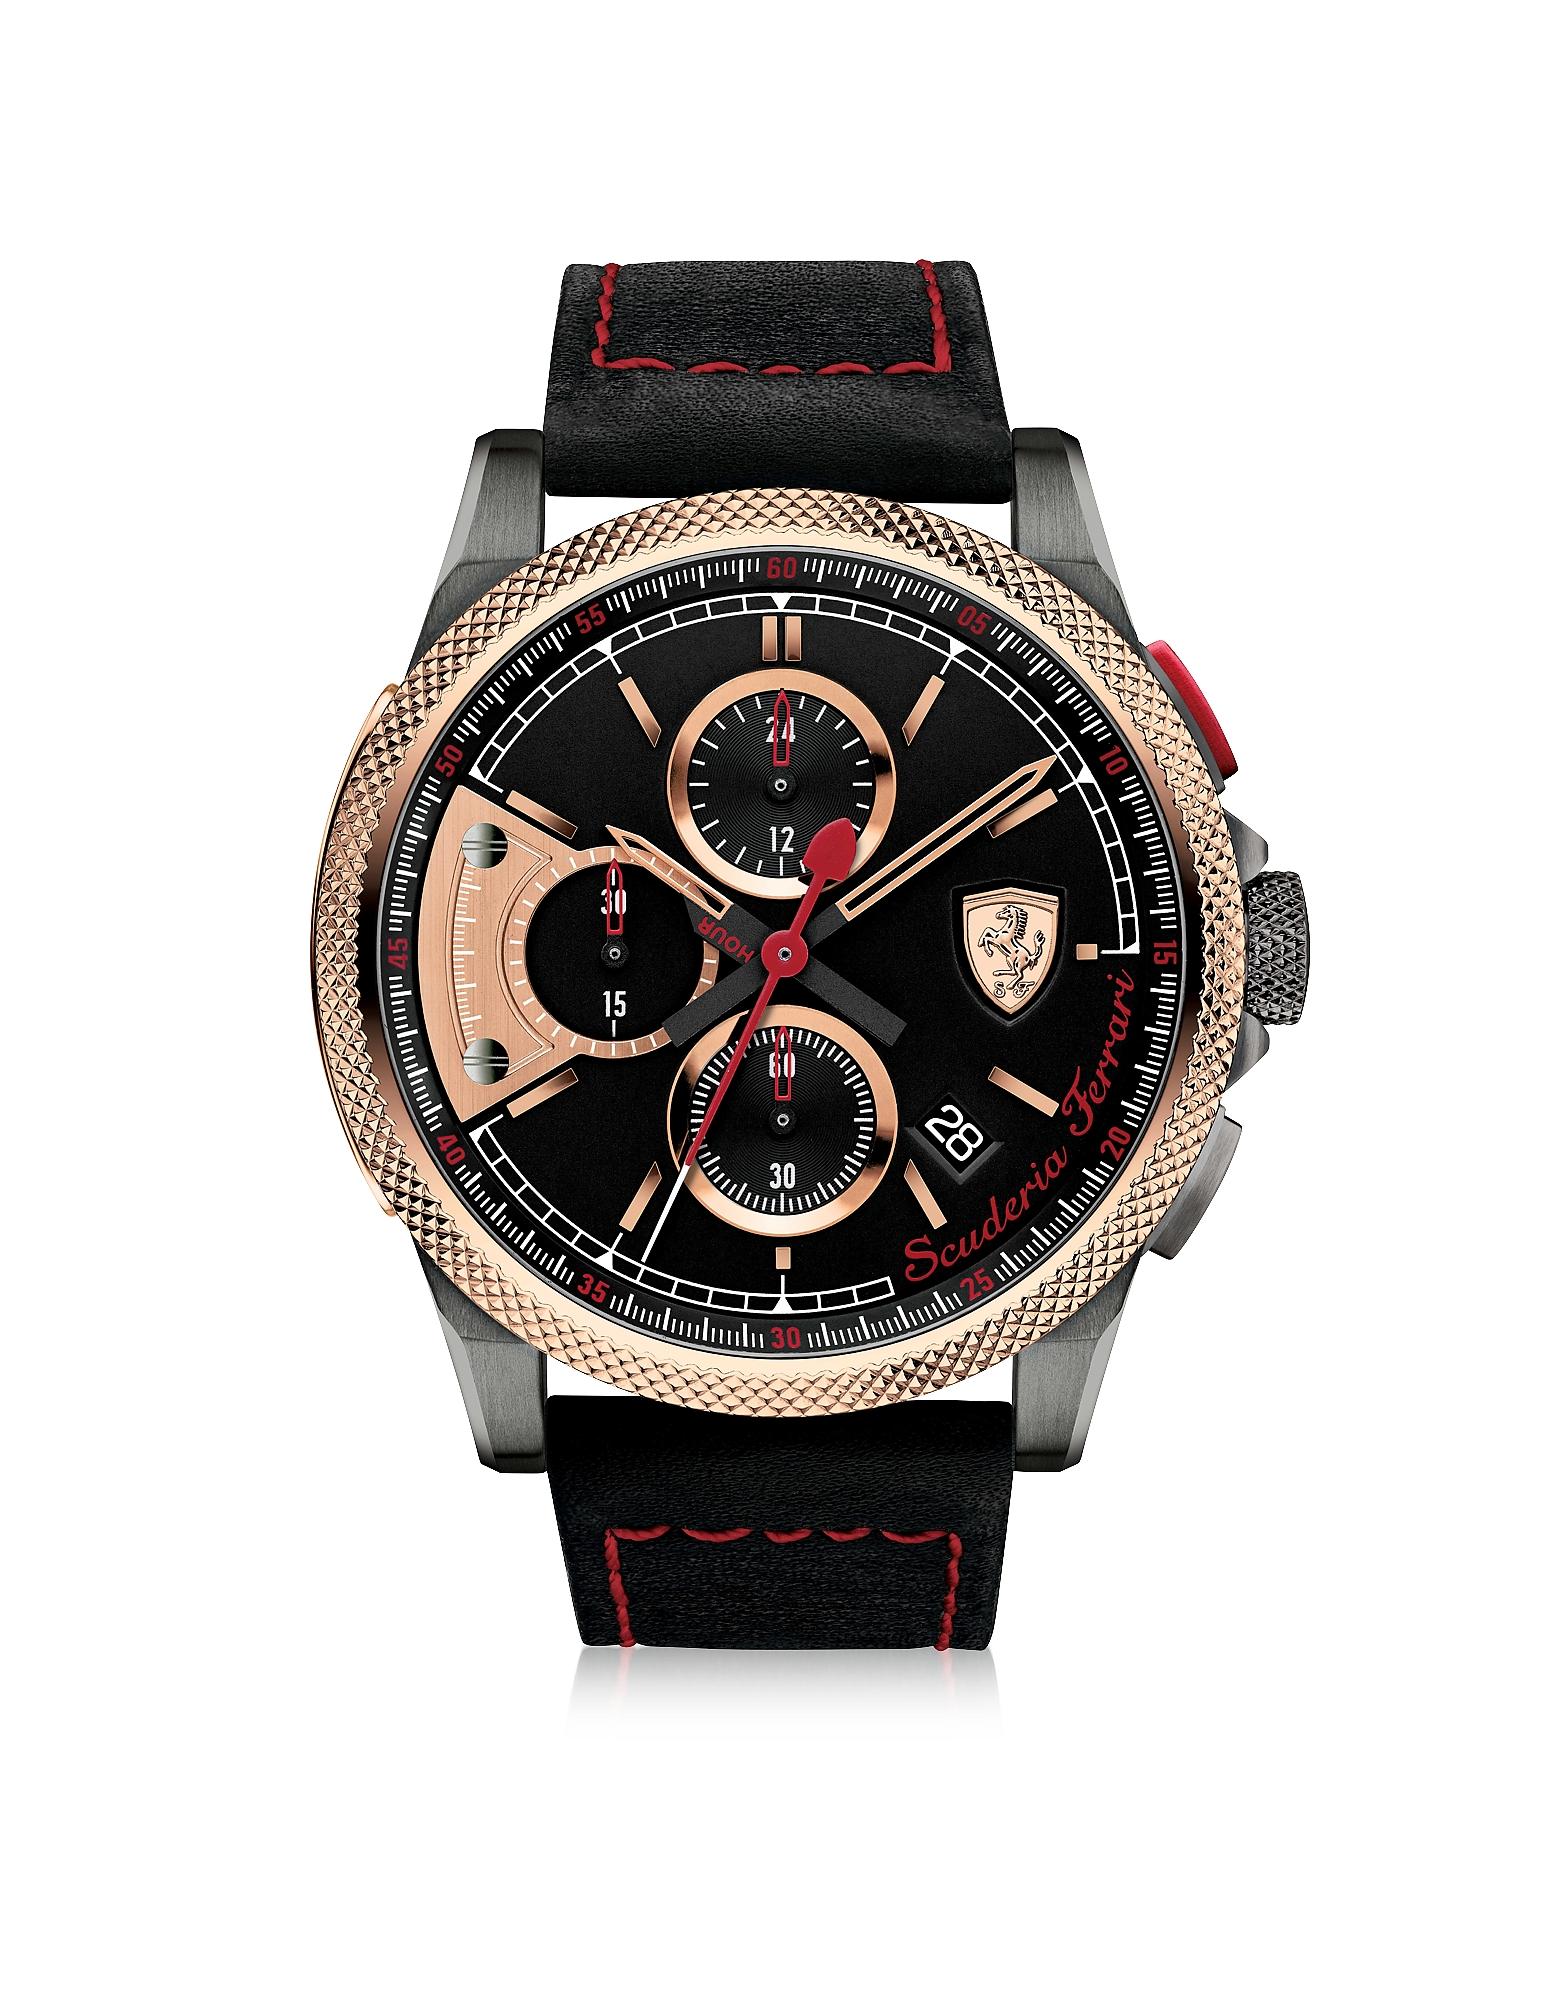 Ferrari Men's Watches, Formula Italia S Stainless Steel Men's Chrono Watch